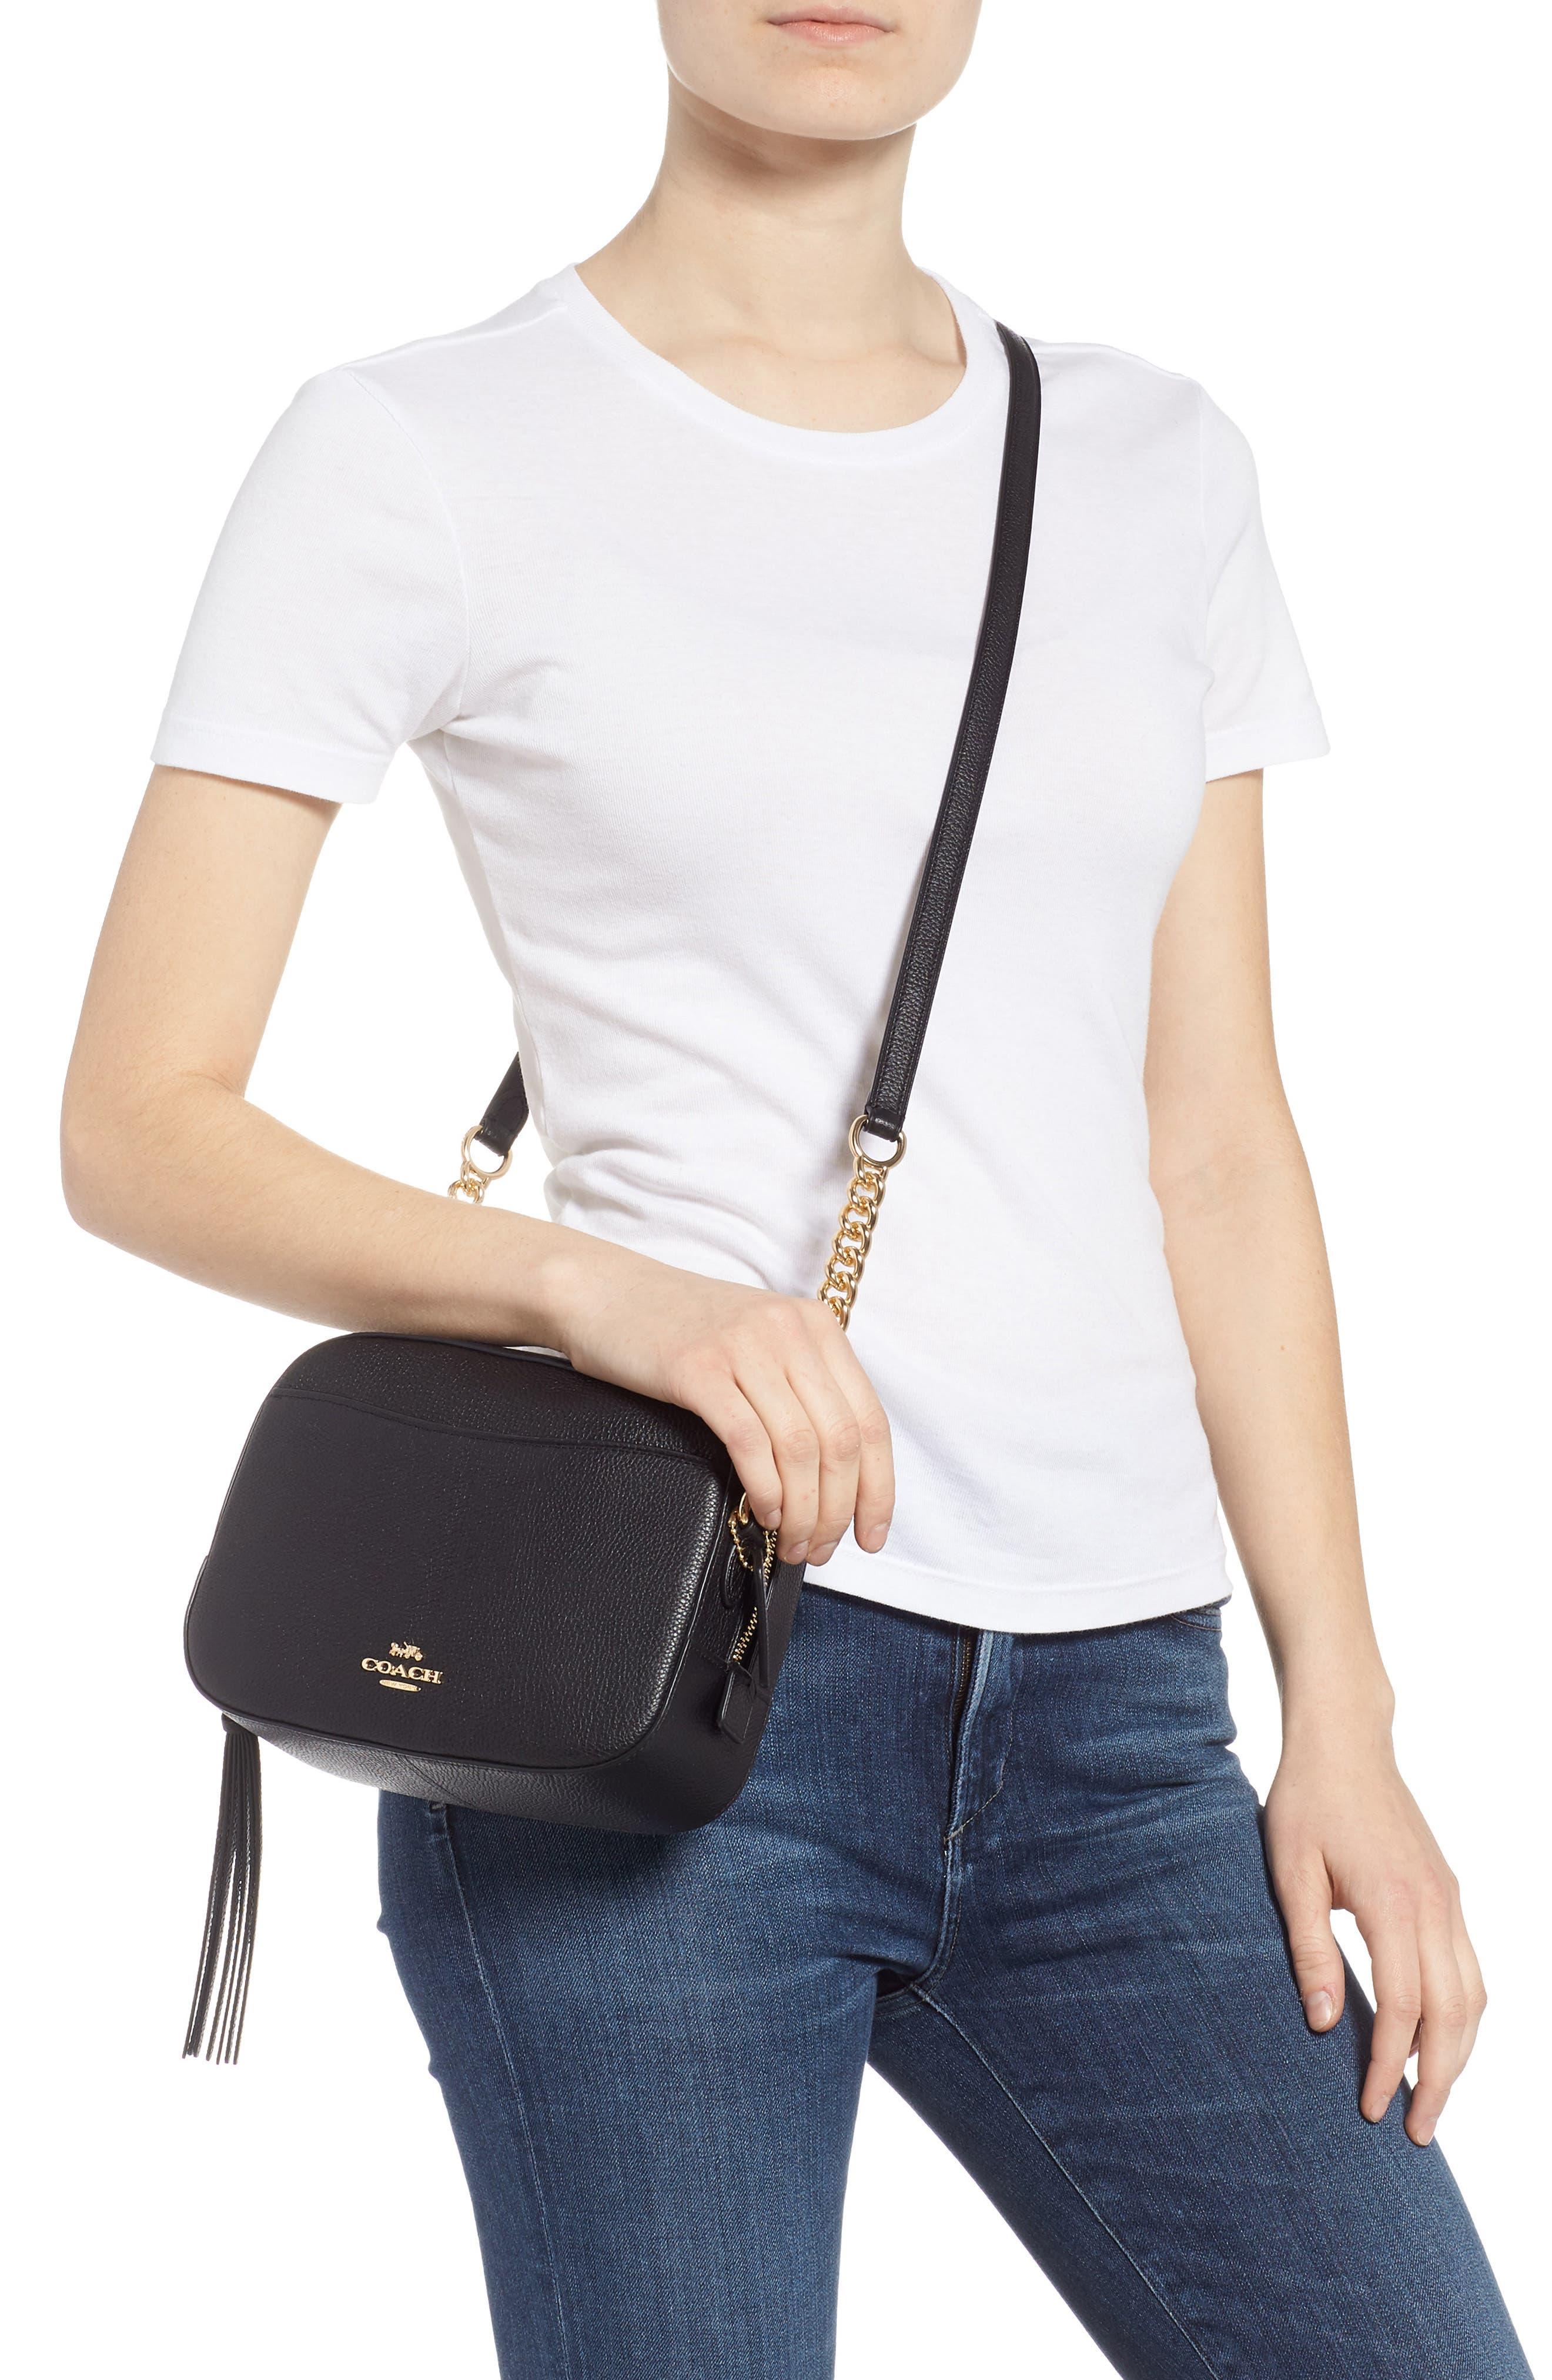 COACH, Pebbled Leather Camera Bag, Alternate thumbnail 2, color, BLACK